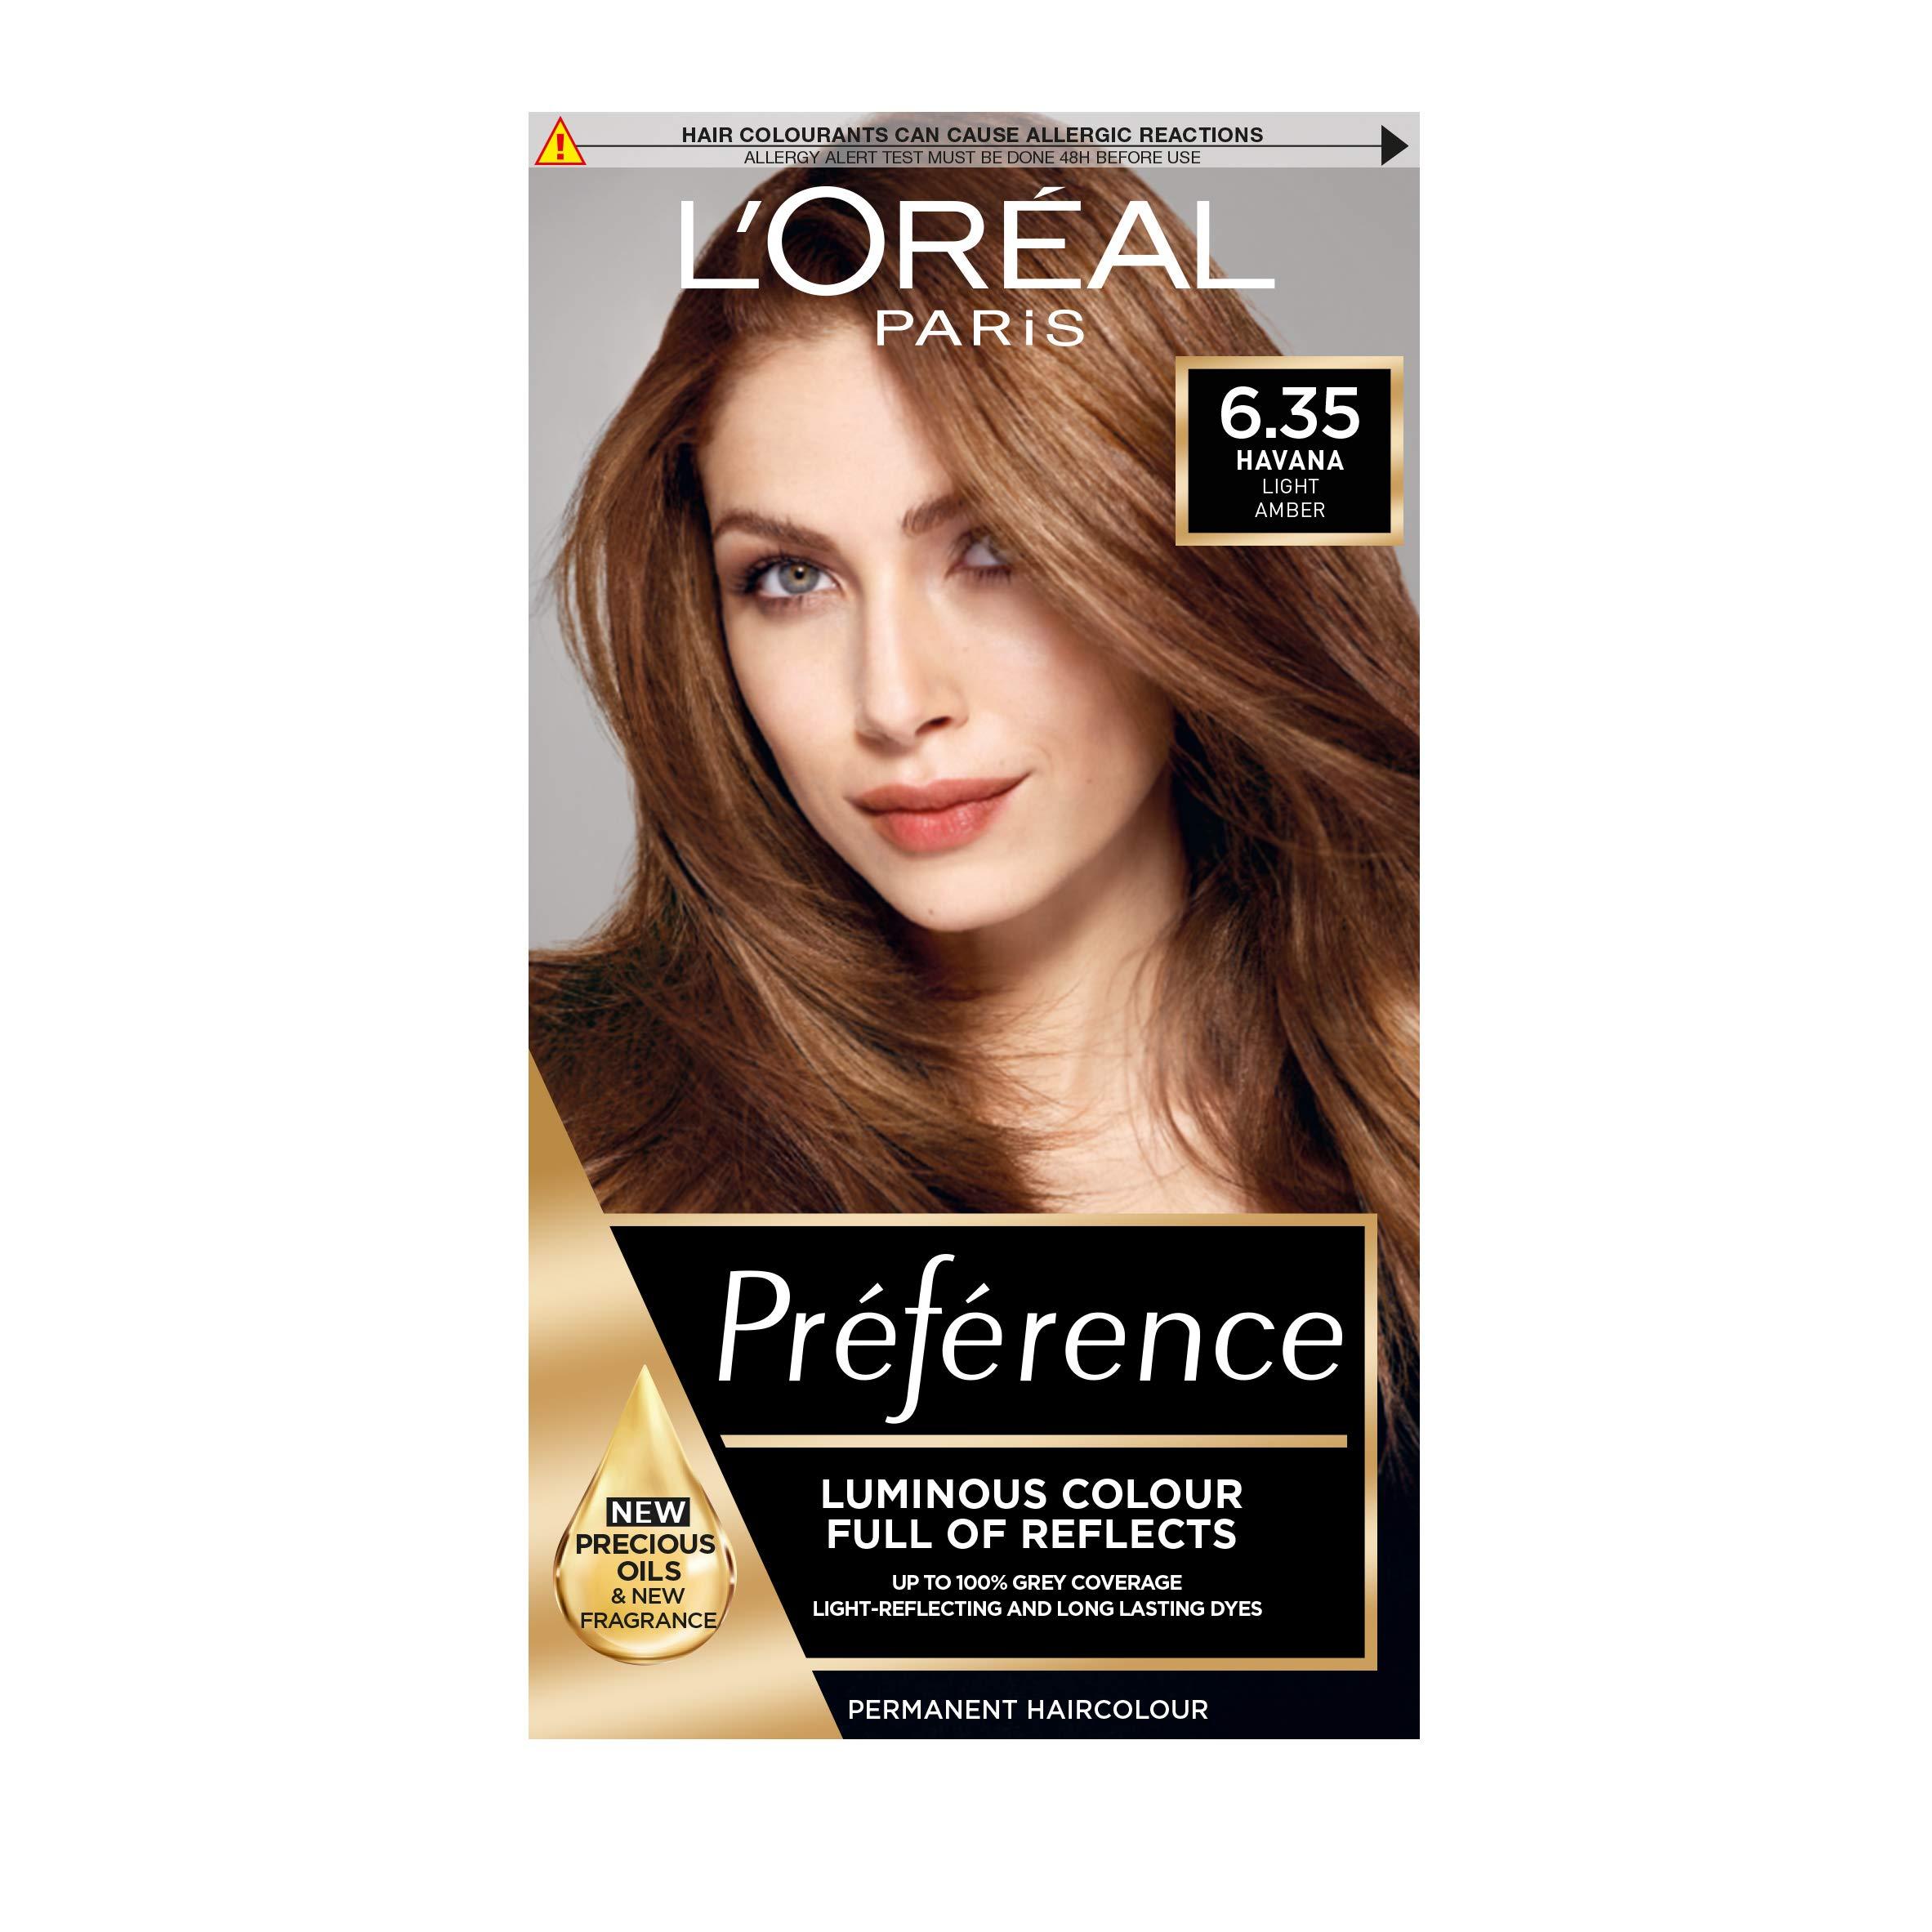 Preference Infinia Hair Dye, 6.35 Havana Golden Mahogany Light Brown